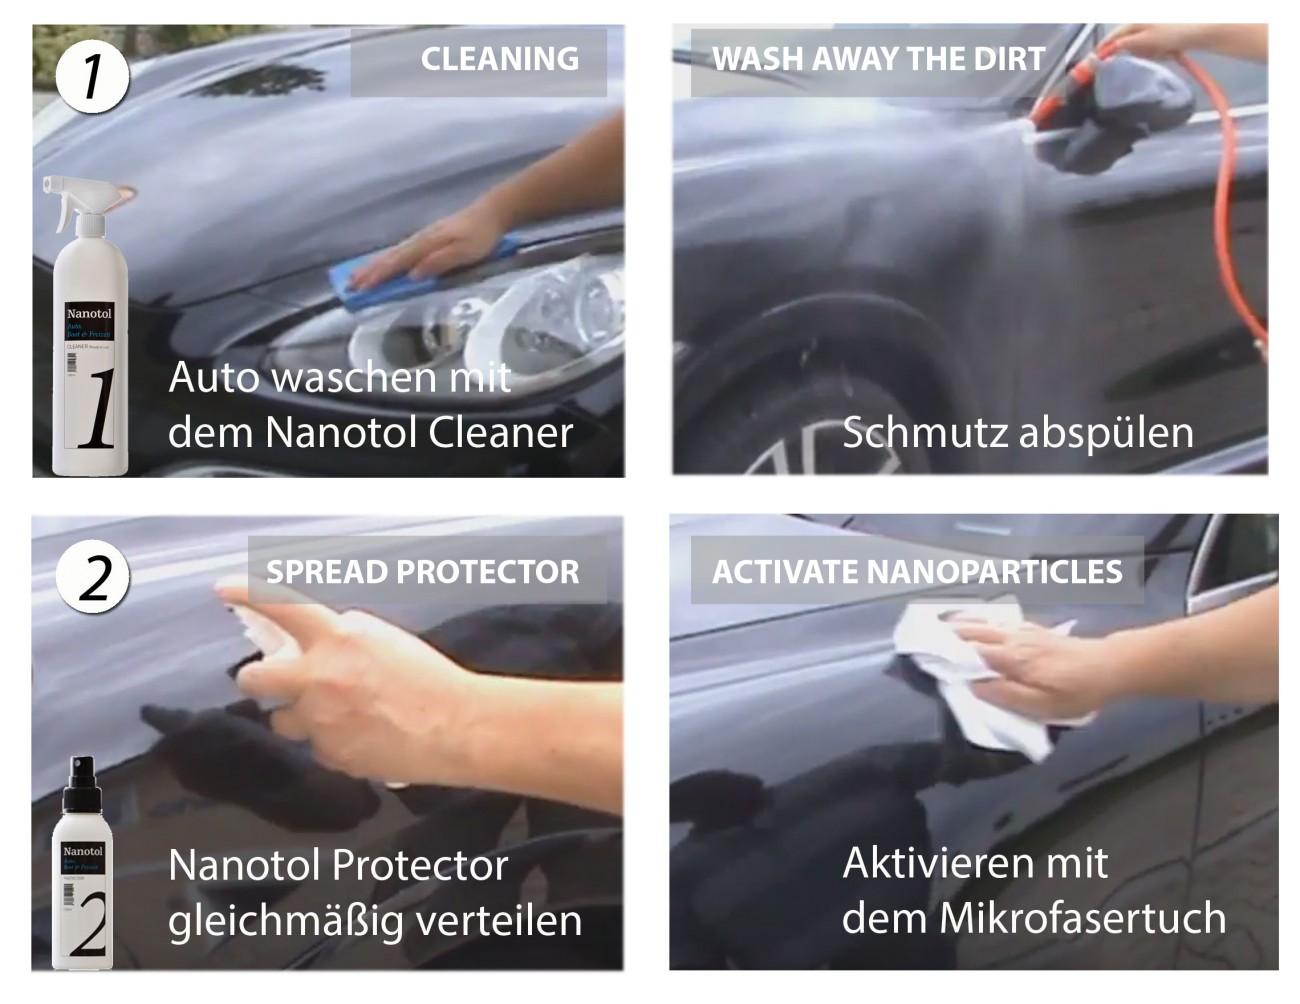 media/image/Anwendung-ABF-Cleaner-Protector_ENTlKqgG27nBc7y.jpg